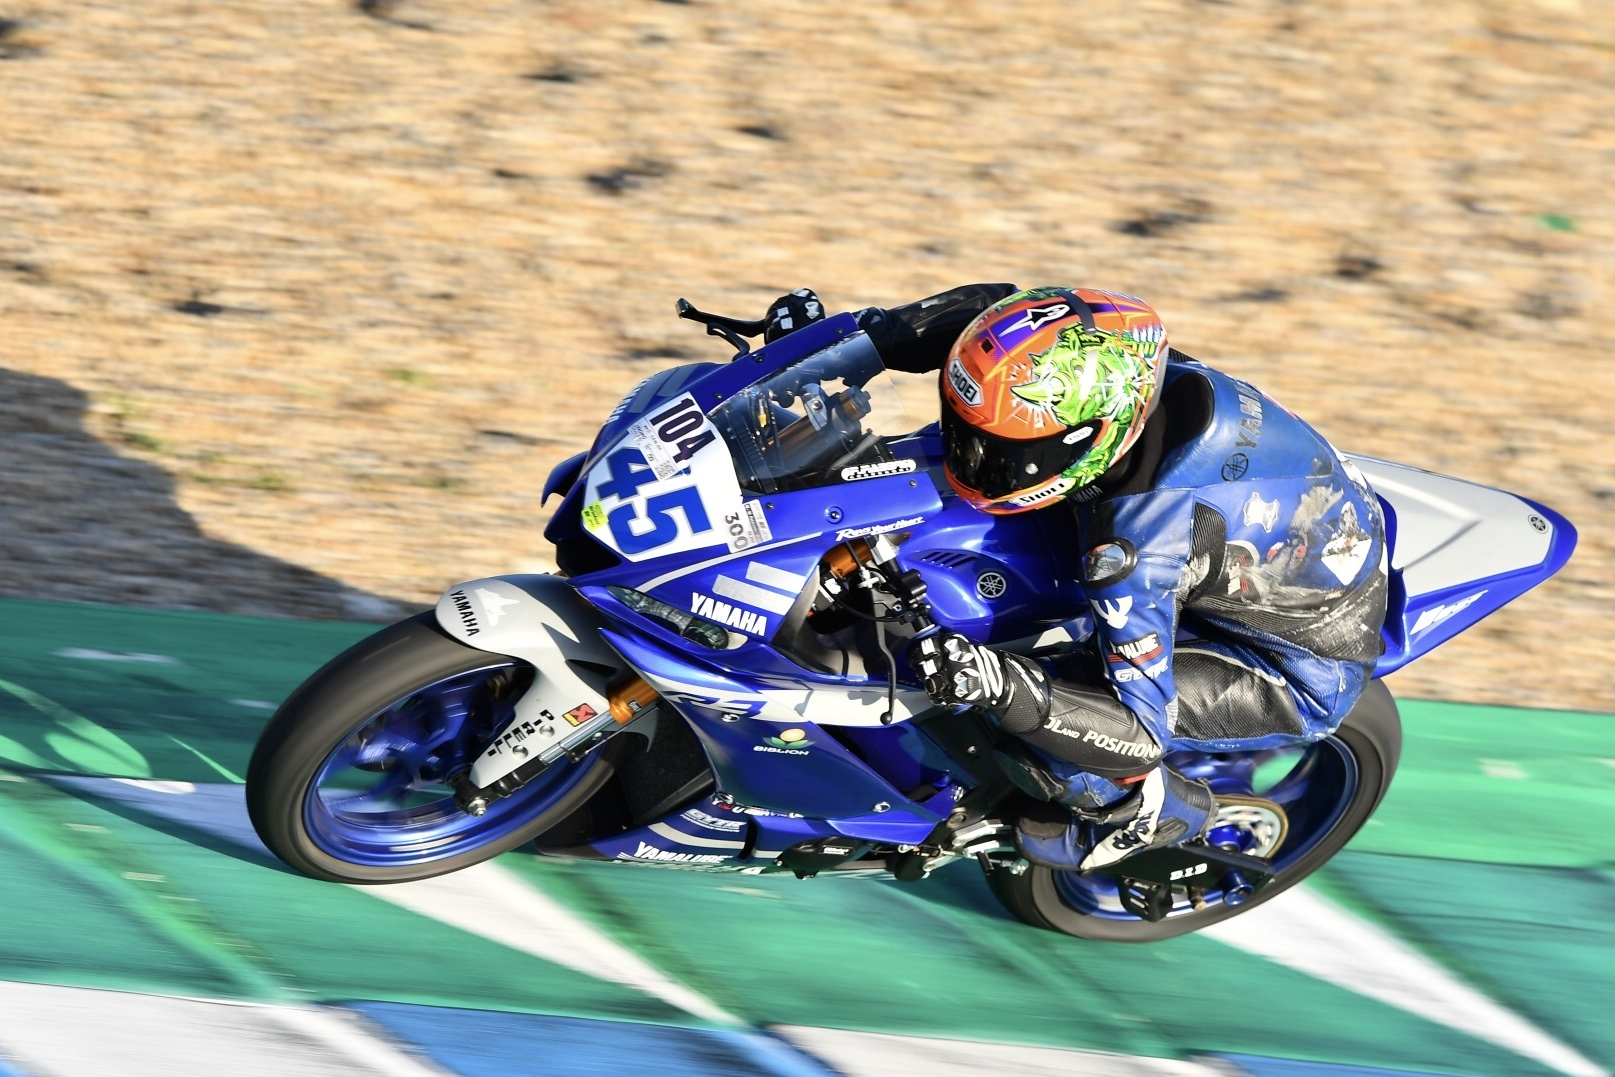 Daniel Blin za czasu startów w World Supersport 300